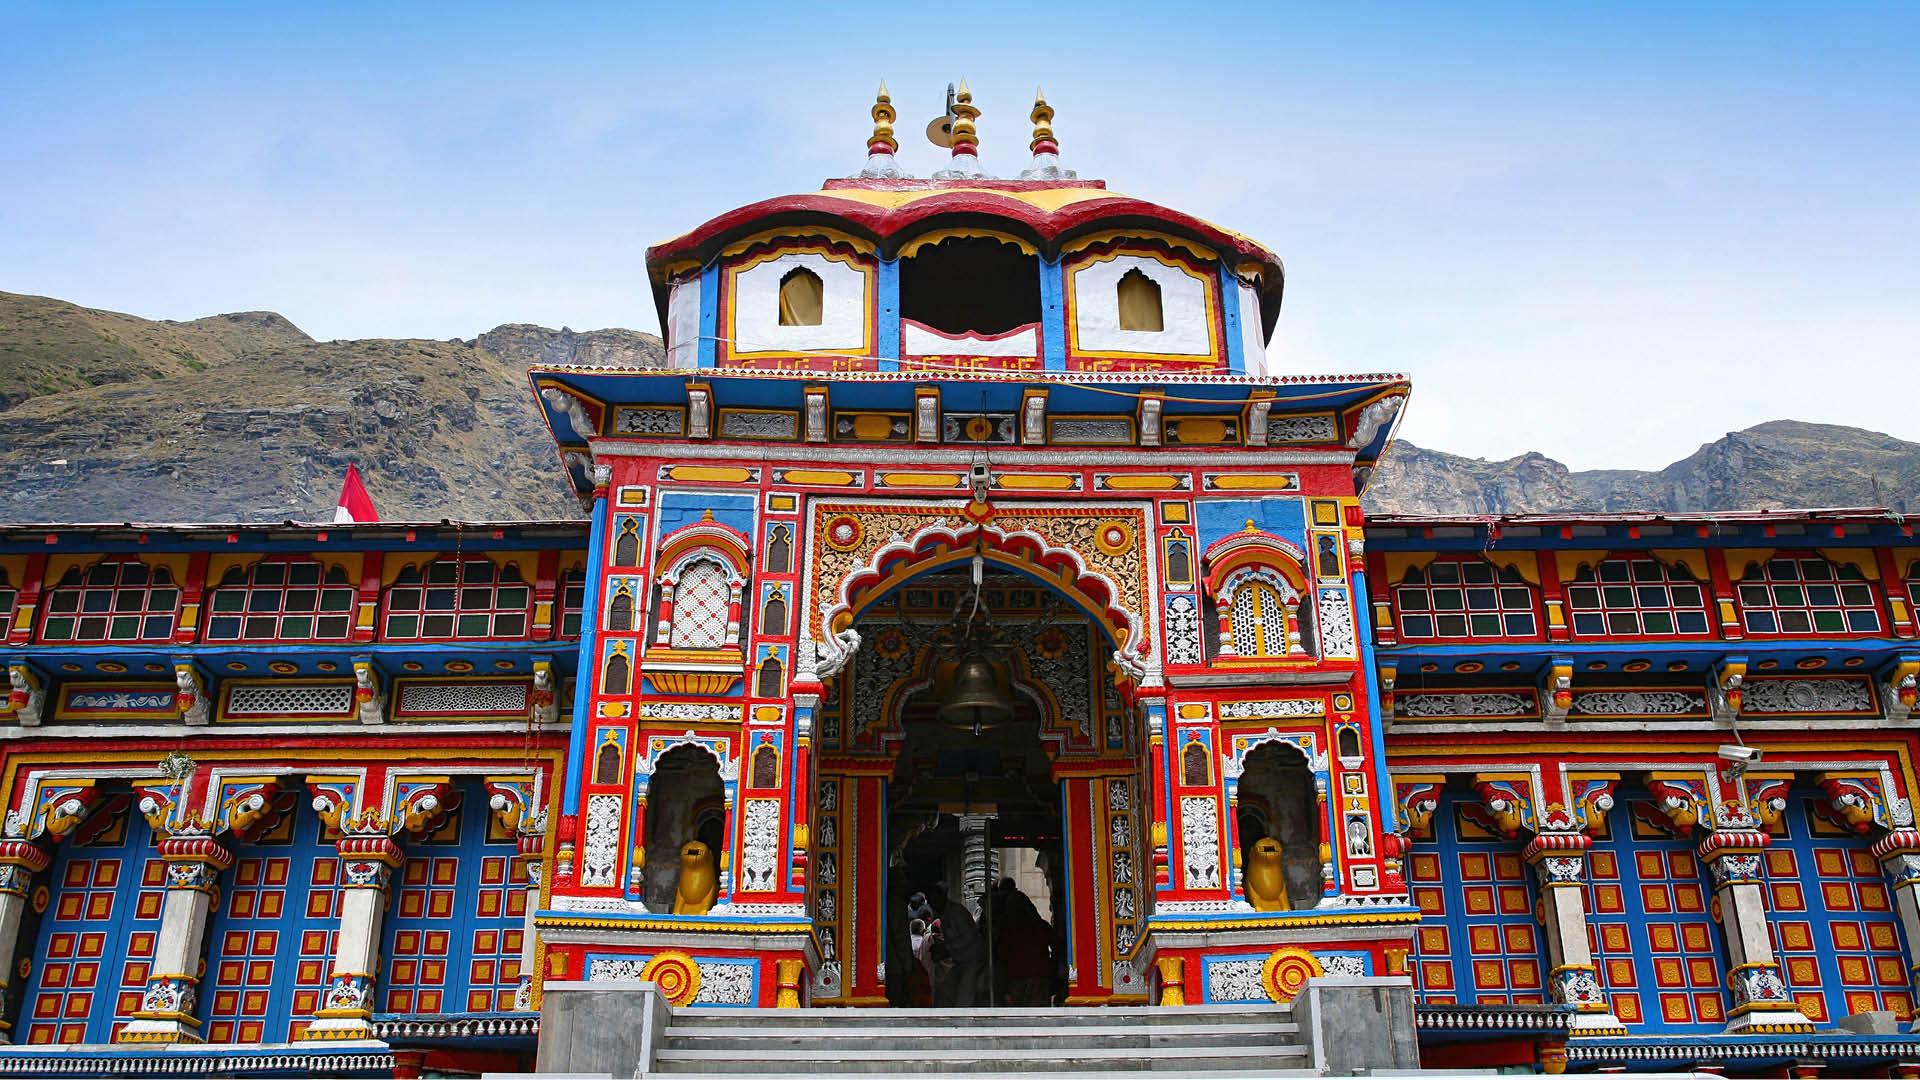 Badrinath temple Yatra 2021 By Helicopter (बद्री विशाल हेलीकॉप्टर यात्रा) [2021 Update]